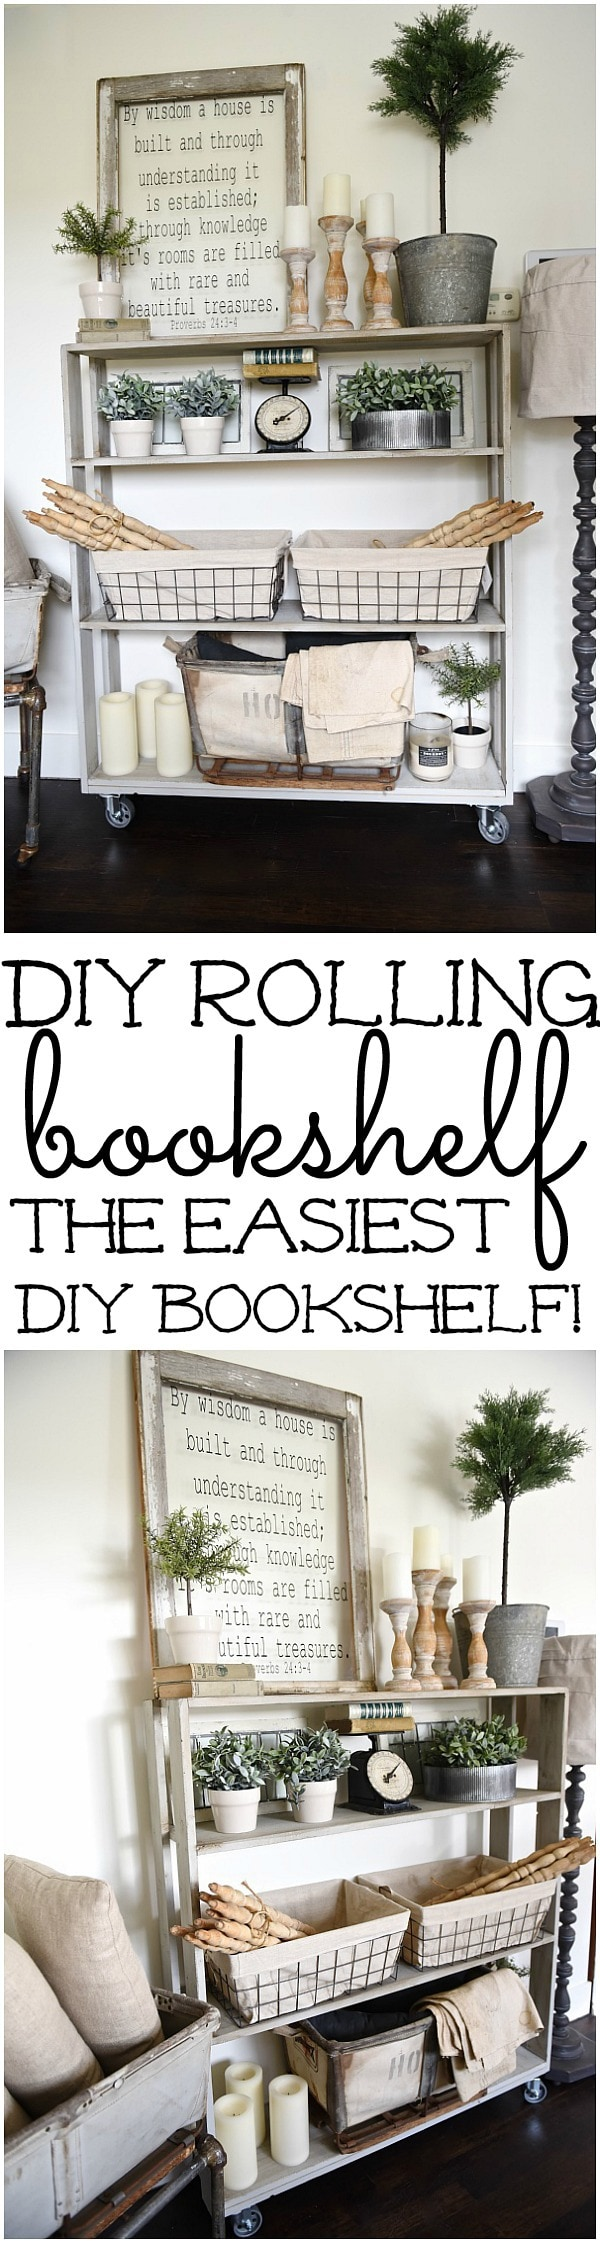 Diy Rolling Bookshelf Liz Marie Blog